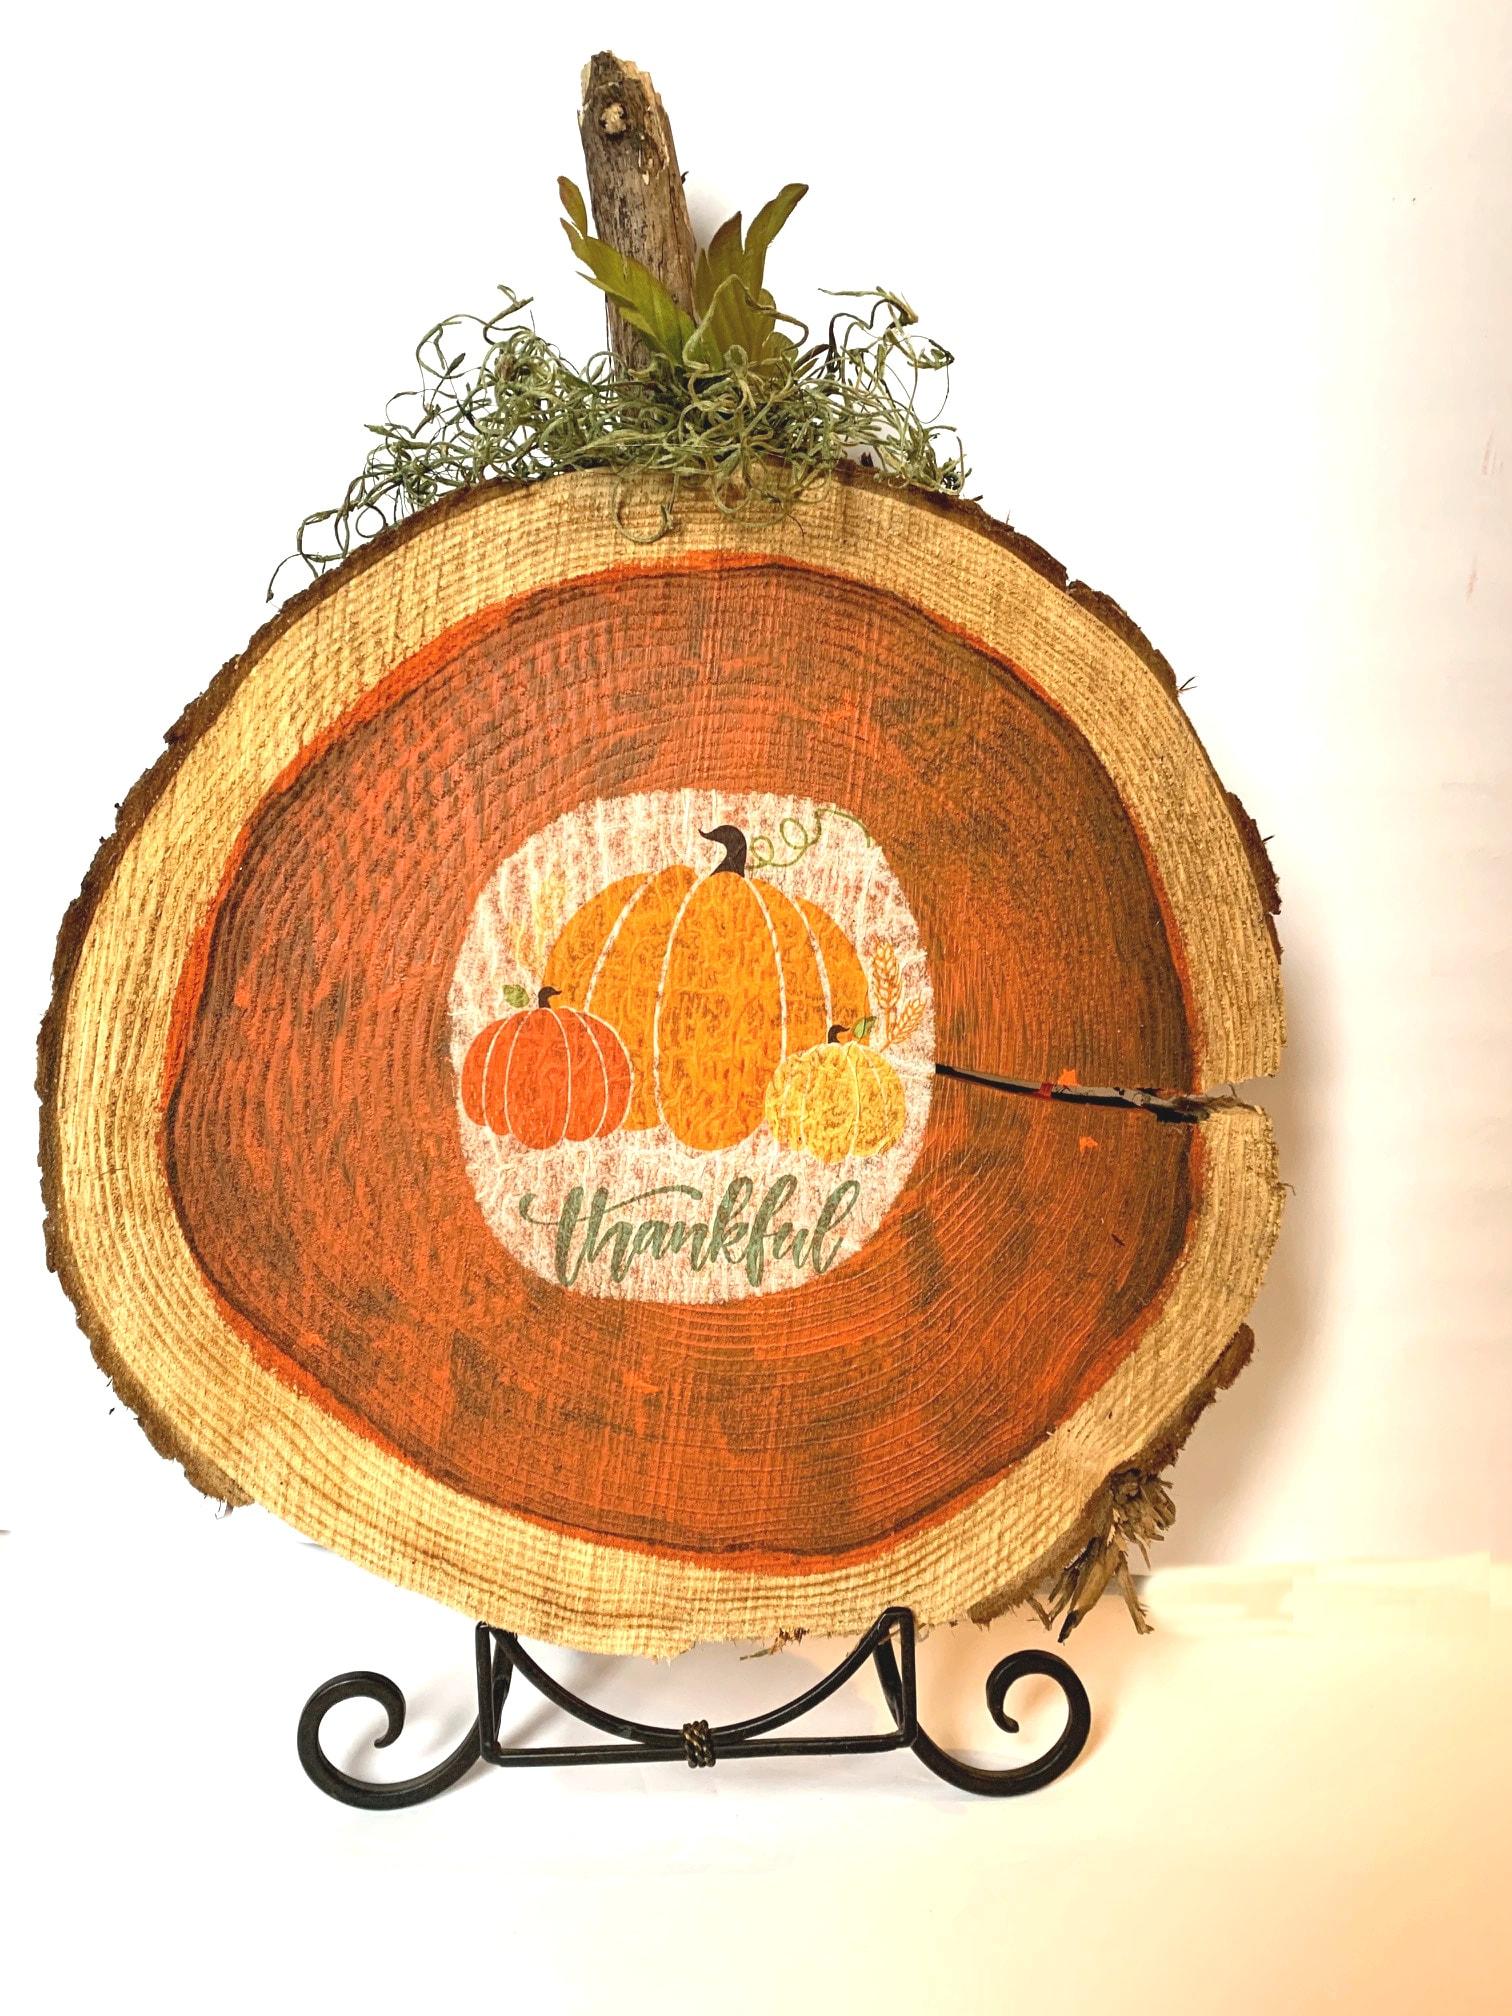 Displaying Wood Pumpkins